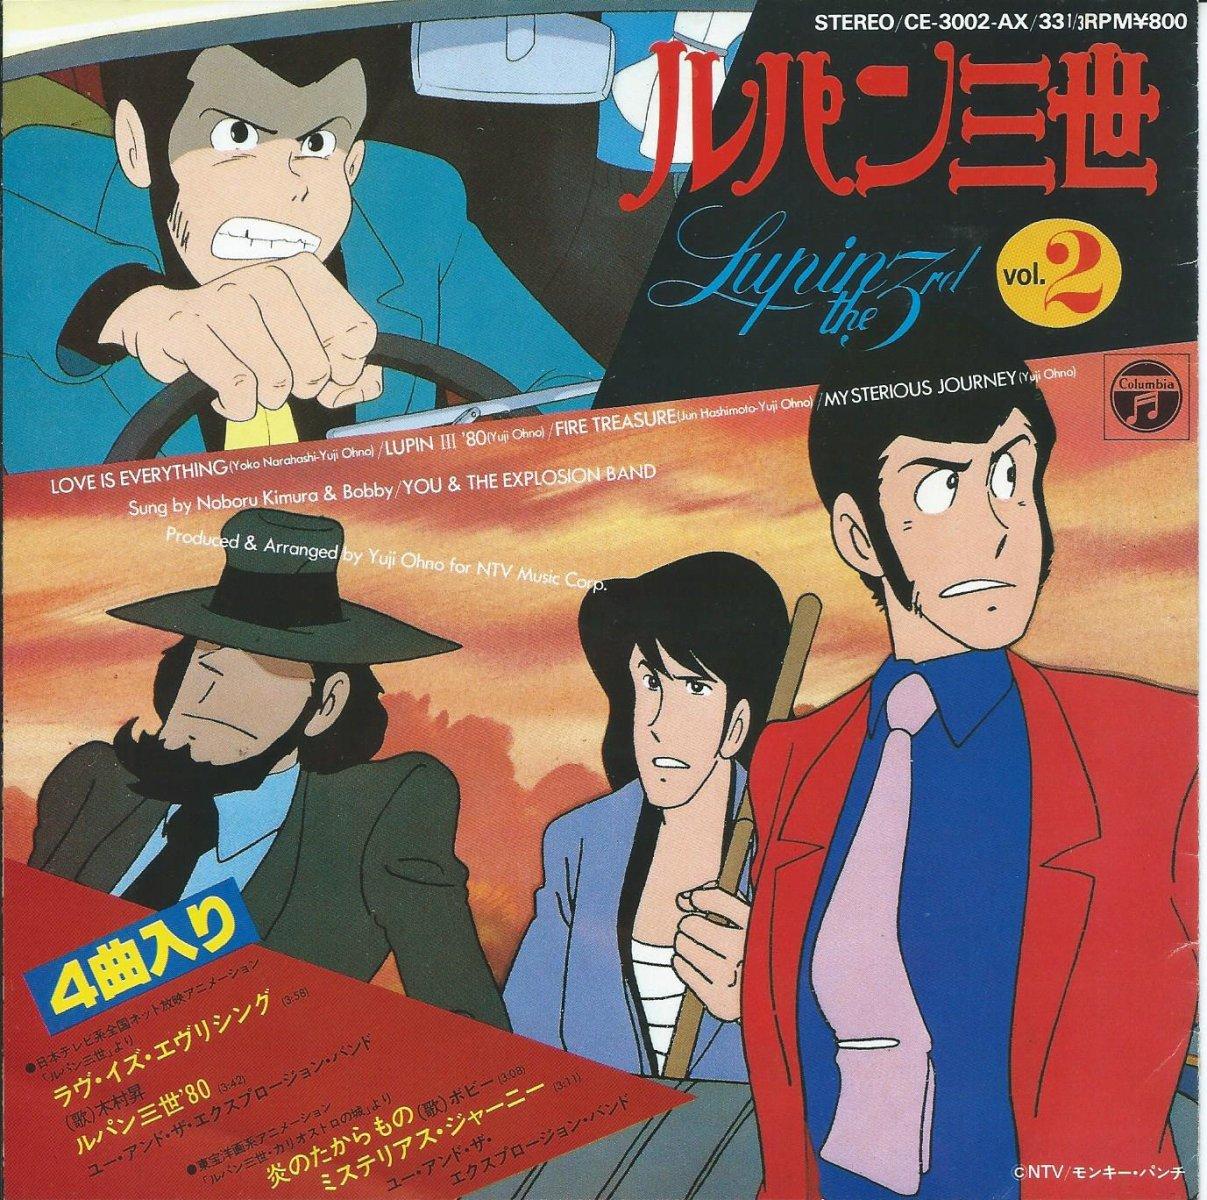 O.S.T.(大野雄二, ユー・アンド・エクスプロージョン・バンド) / ラヴ・イズ・エヴリシング / ルパン三世'80 (7